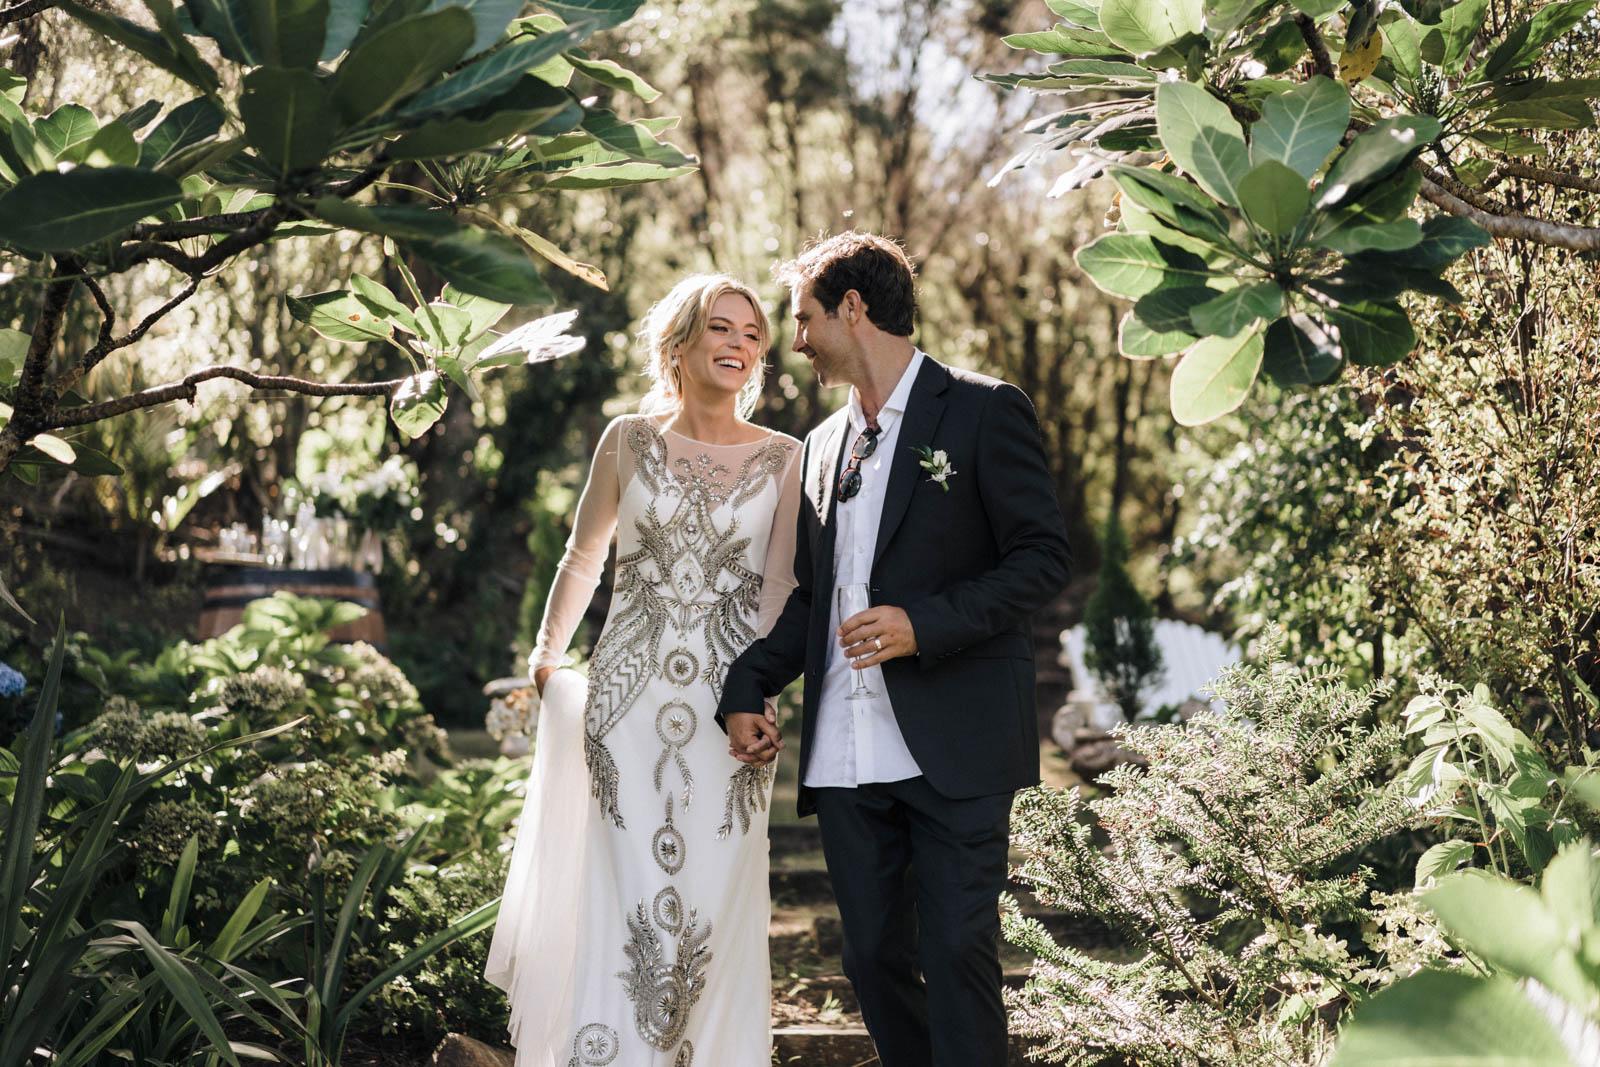 newfound-l-i-coromandel-wedding-photographer-1712-A9_03615